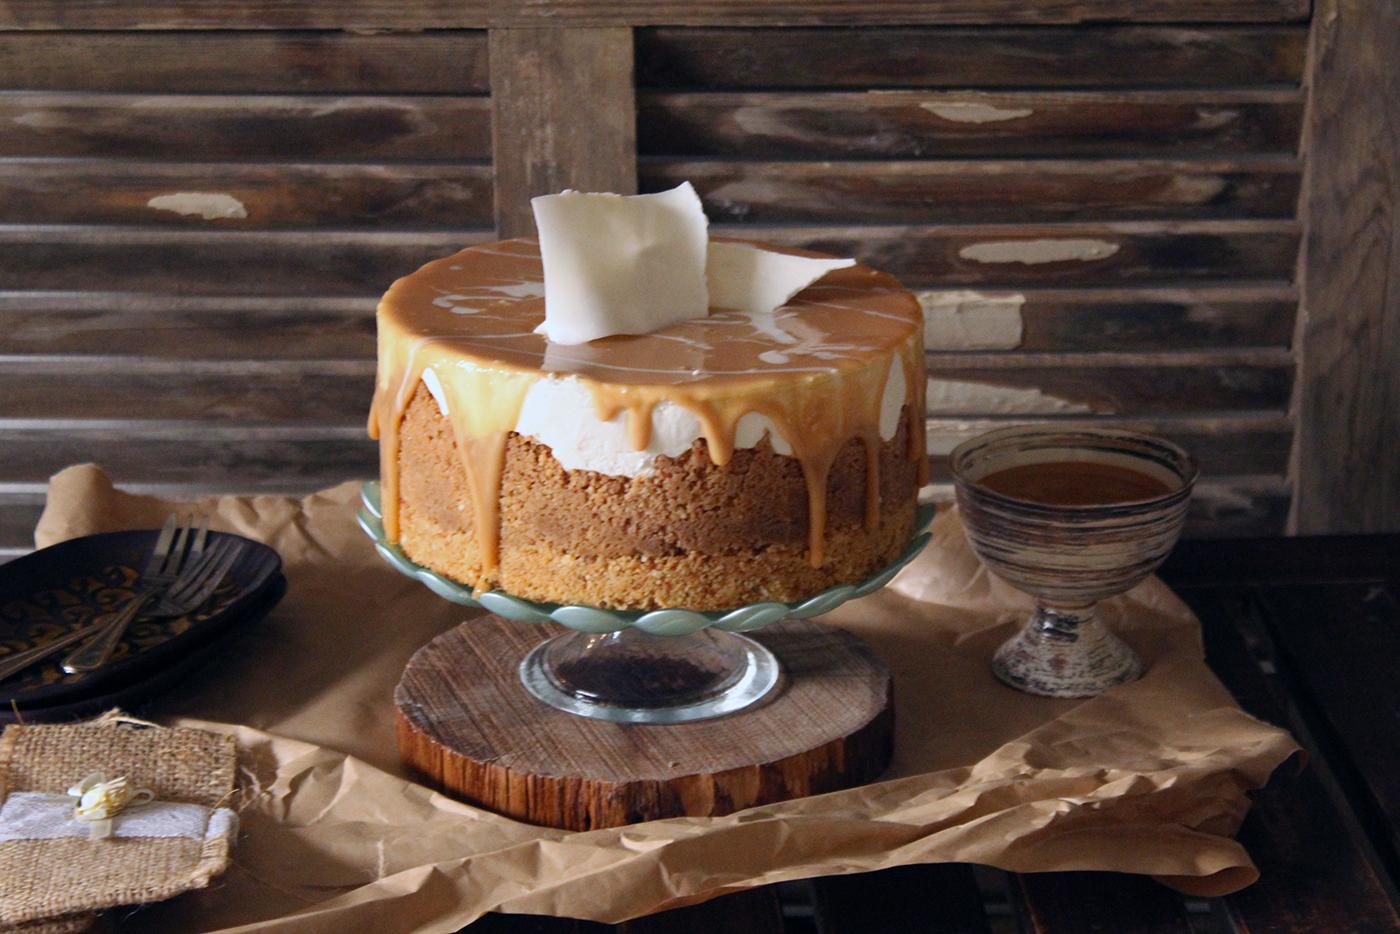 IMG 8320 - עוגת גבינה בציפוי ריבת חלב